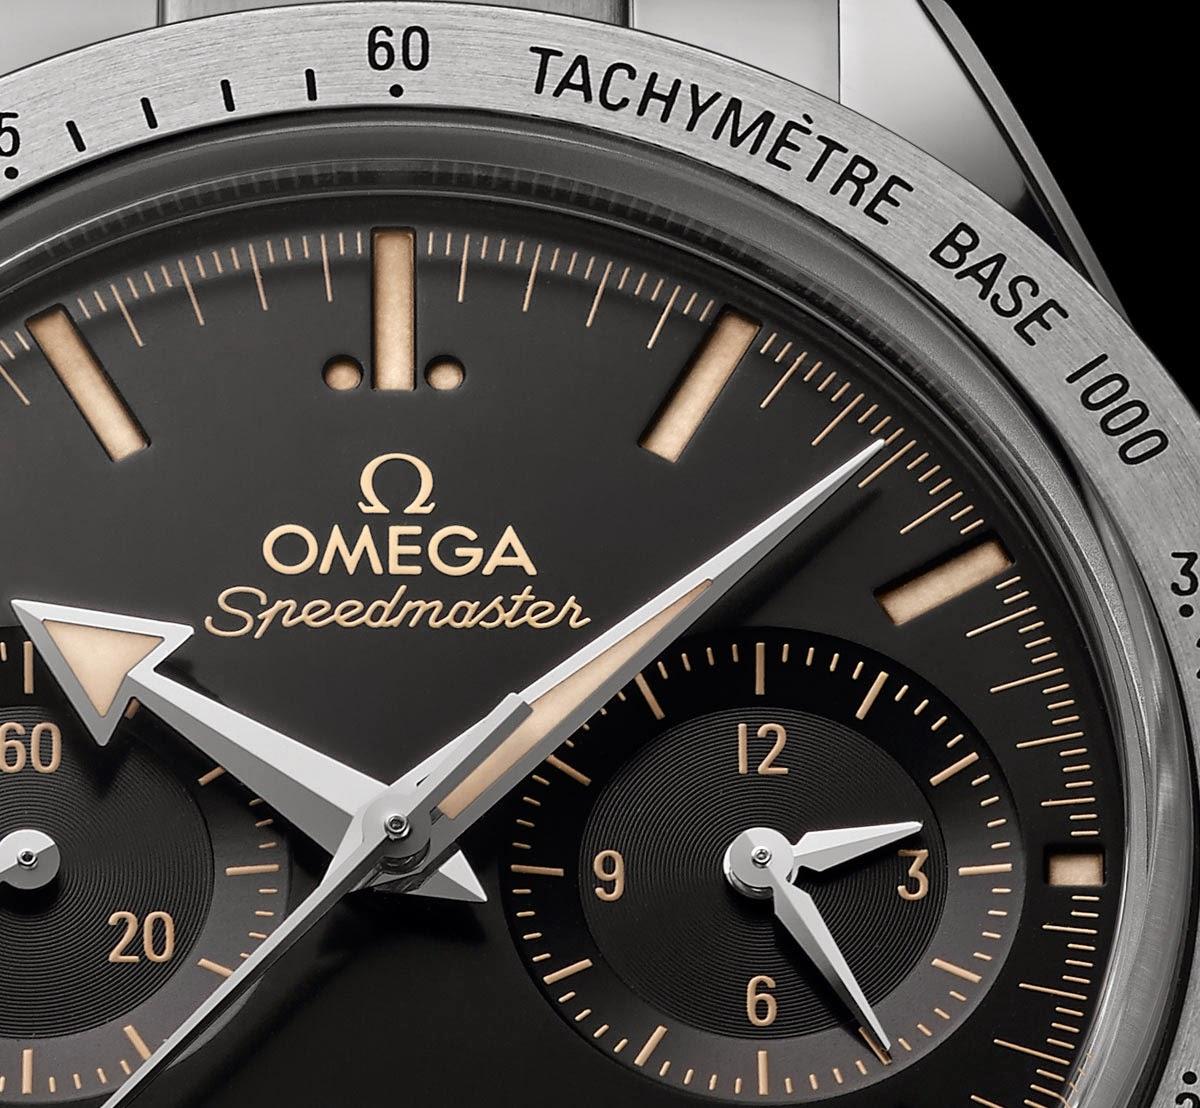 Omega Speedmaster 57 - Edition 2015 Omega_Speedmaster57_2015-Edition_dialdetail_331.10.42.51.01